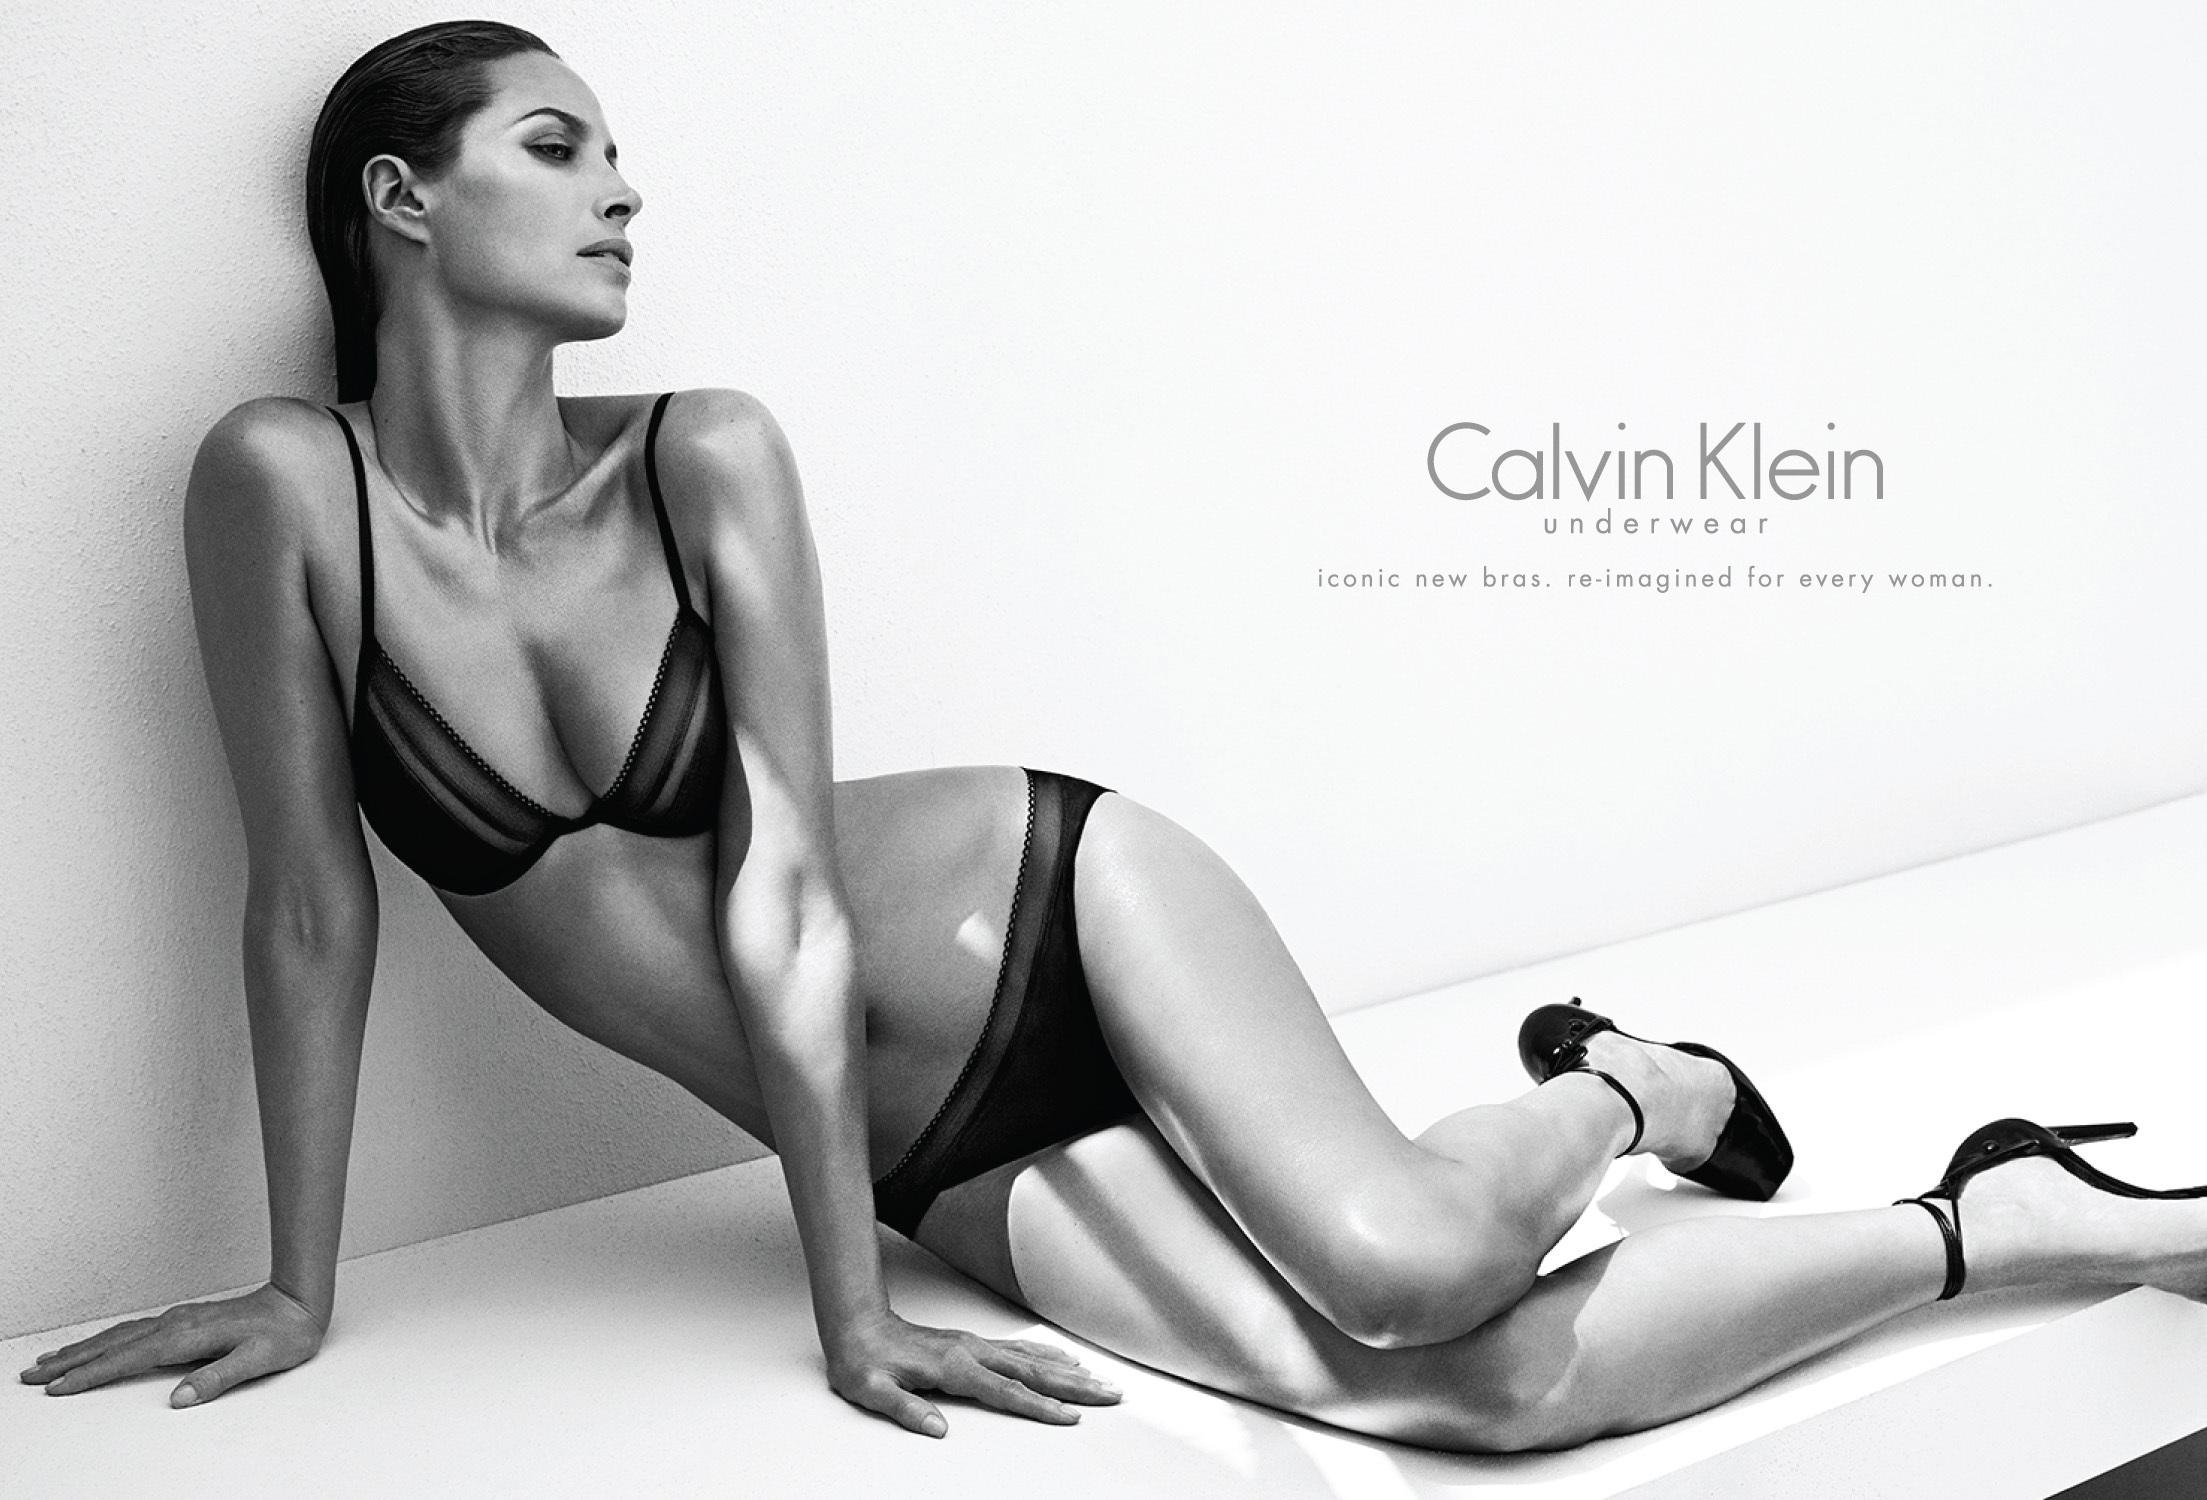 bb1dfbcd3f3 Calvin Klein Underwear Reveals Fall 2013 Global Advertising Campaign  Featuring Model-Activist Christy Turlington Burns